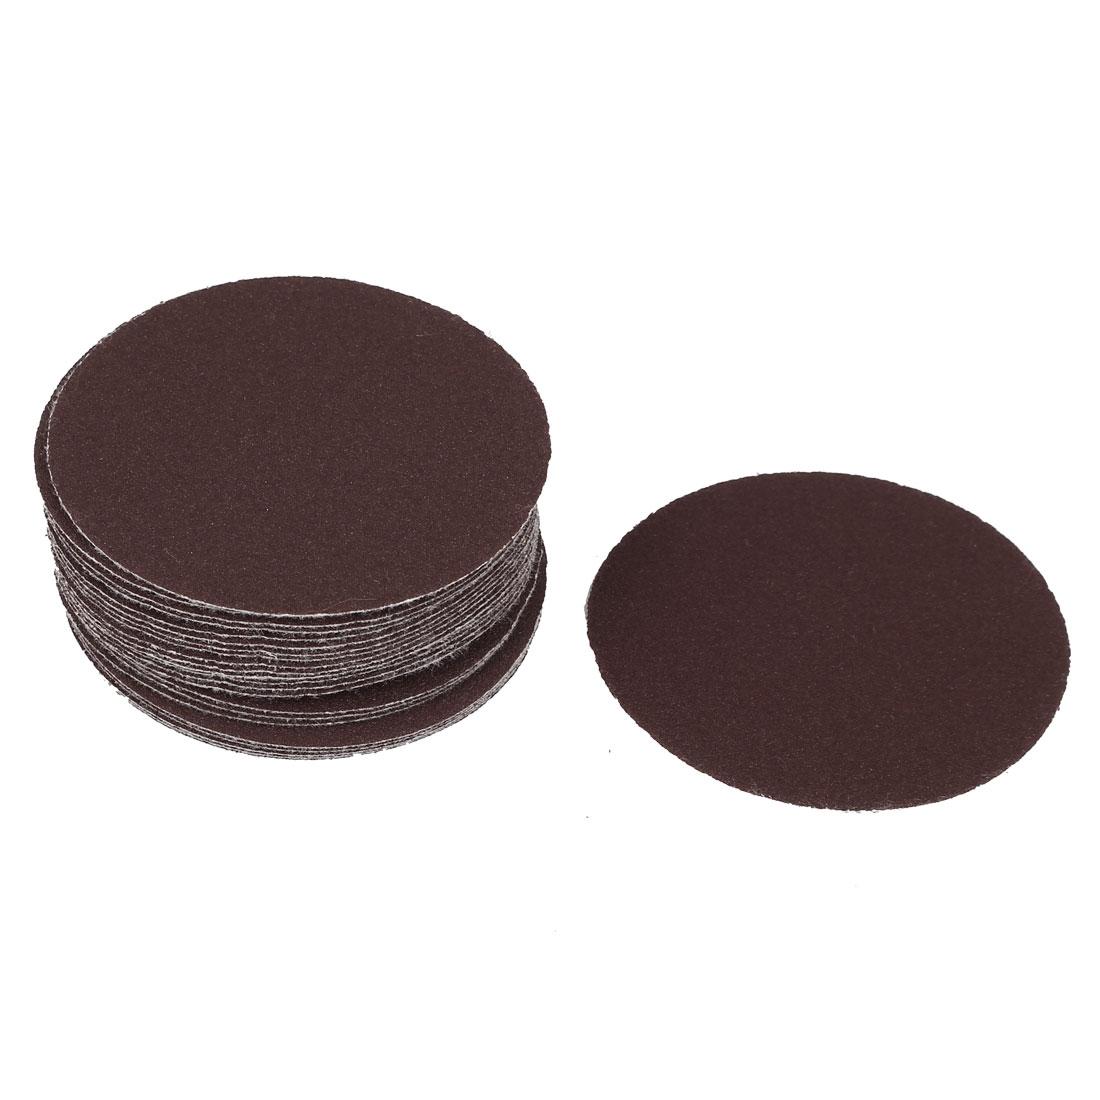 75mm Diameter 120 Grit Abrasives Hook and Loop Sanding Paper Disc Brown 25PCS